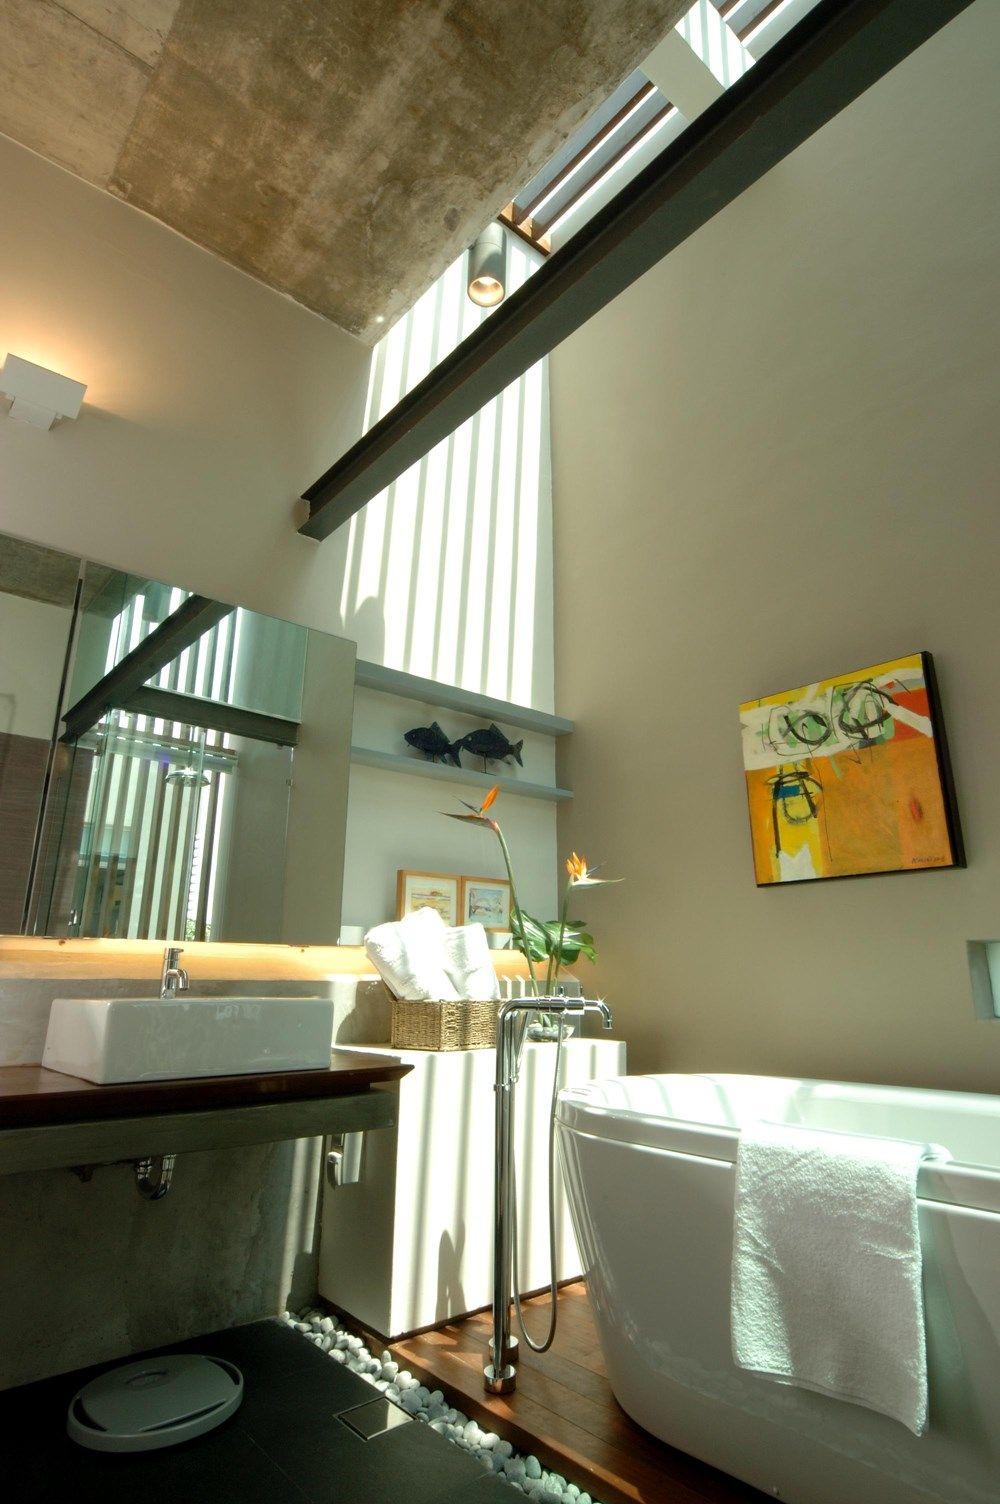 17 home makeover ideas found in malaysia interior design rh pinterest com